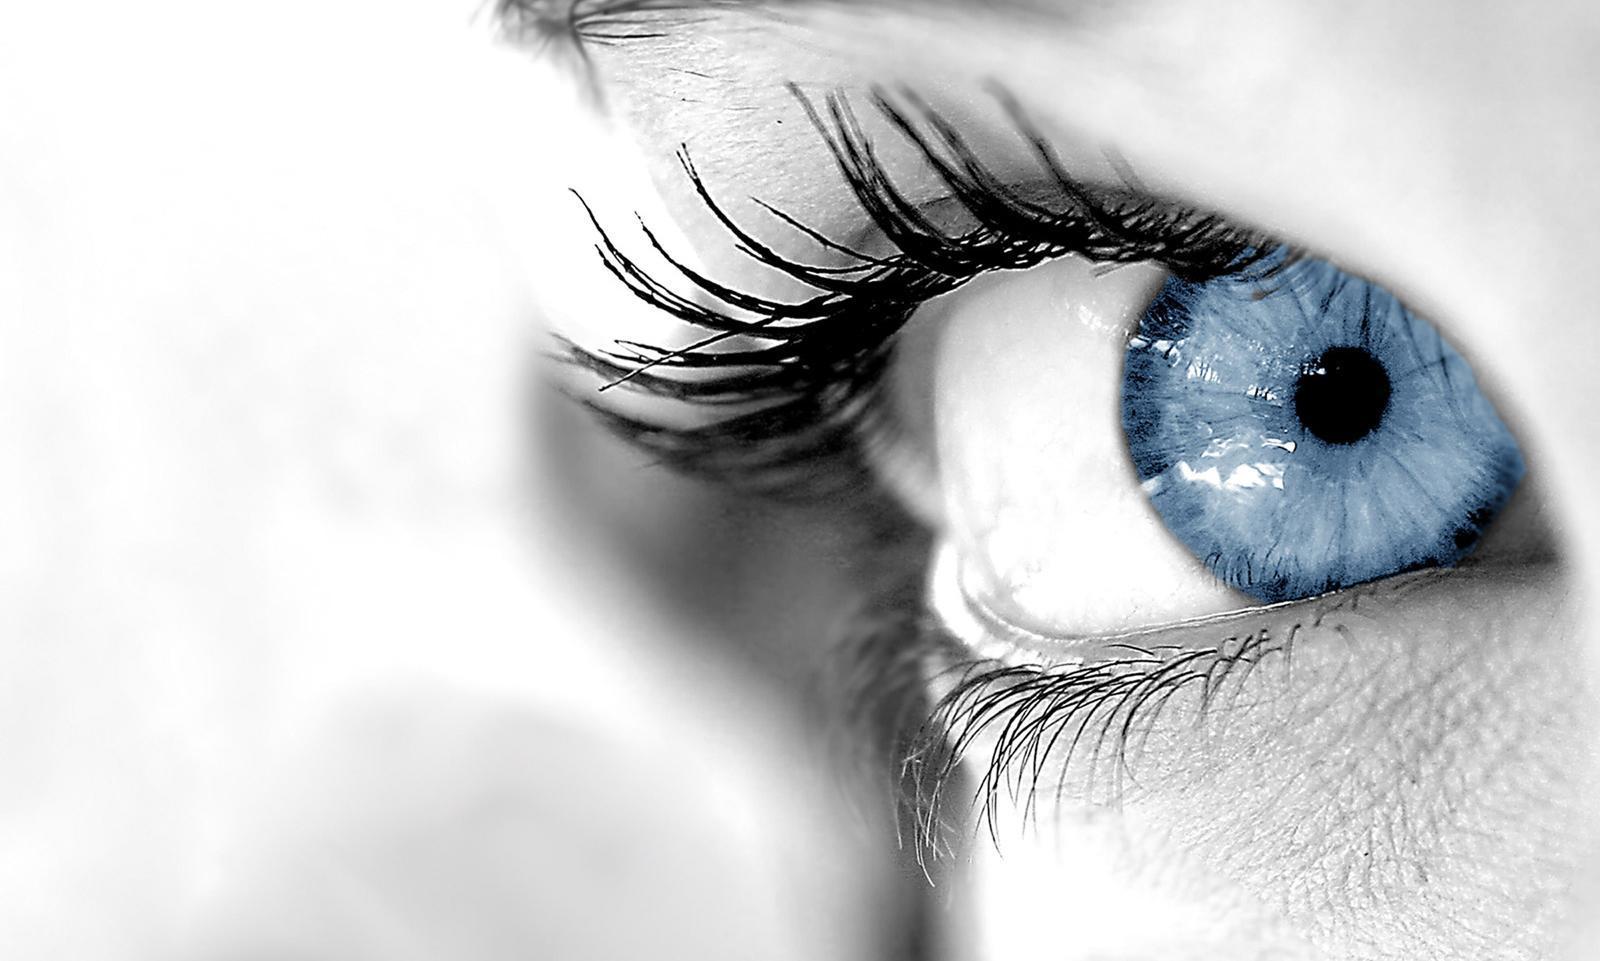 Técnica Lasik de Cirurgia Ocular a Laser